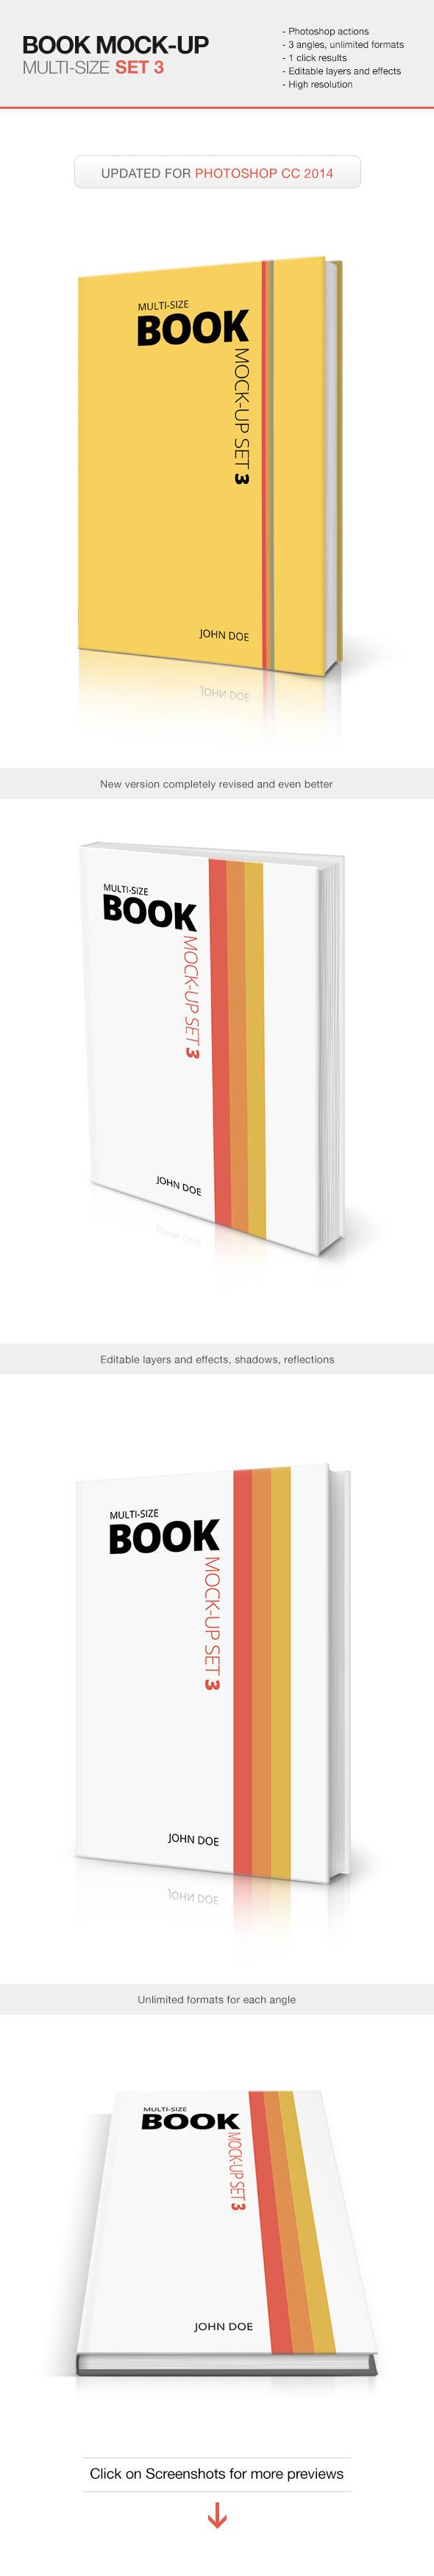 Multi-size Book Mockup - Set 3 - Utilities Actions